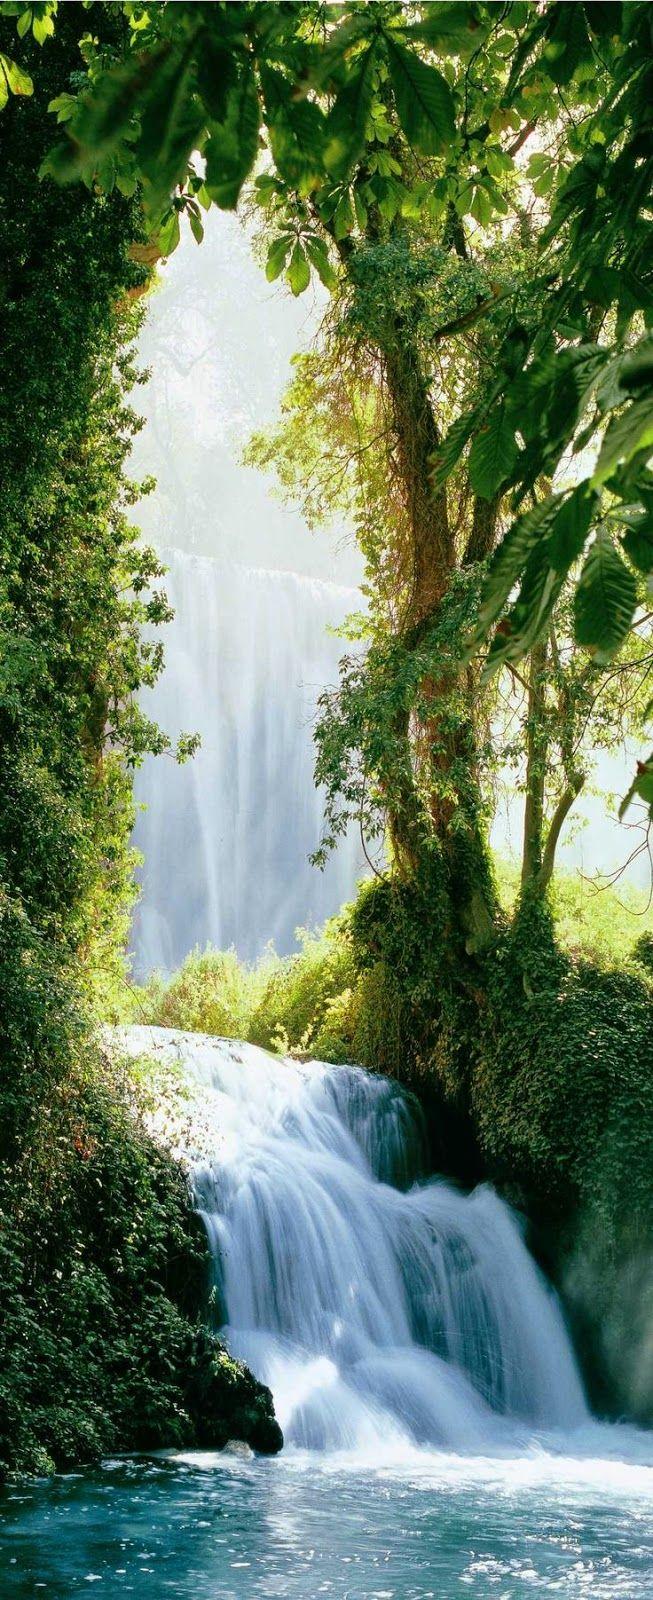 Landscape waterfall ~ Dreamy Nature